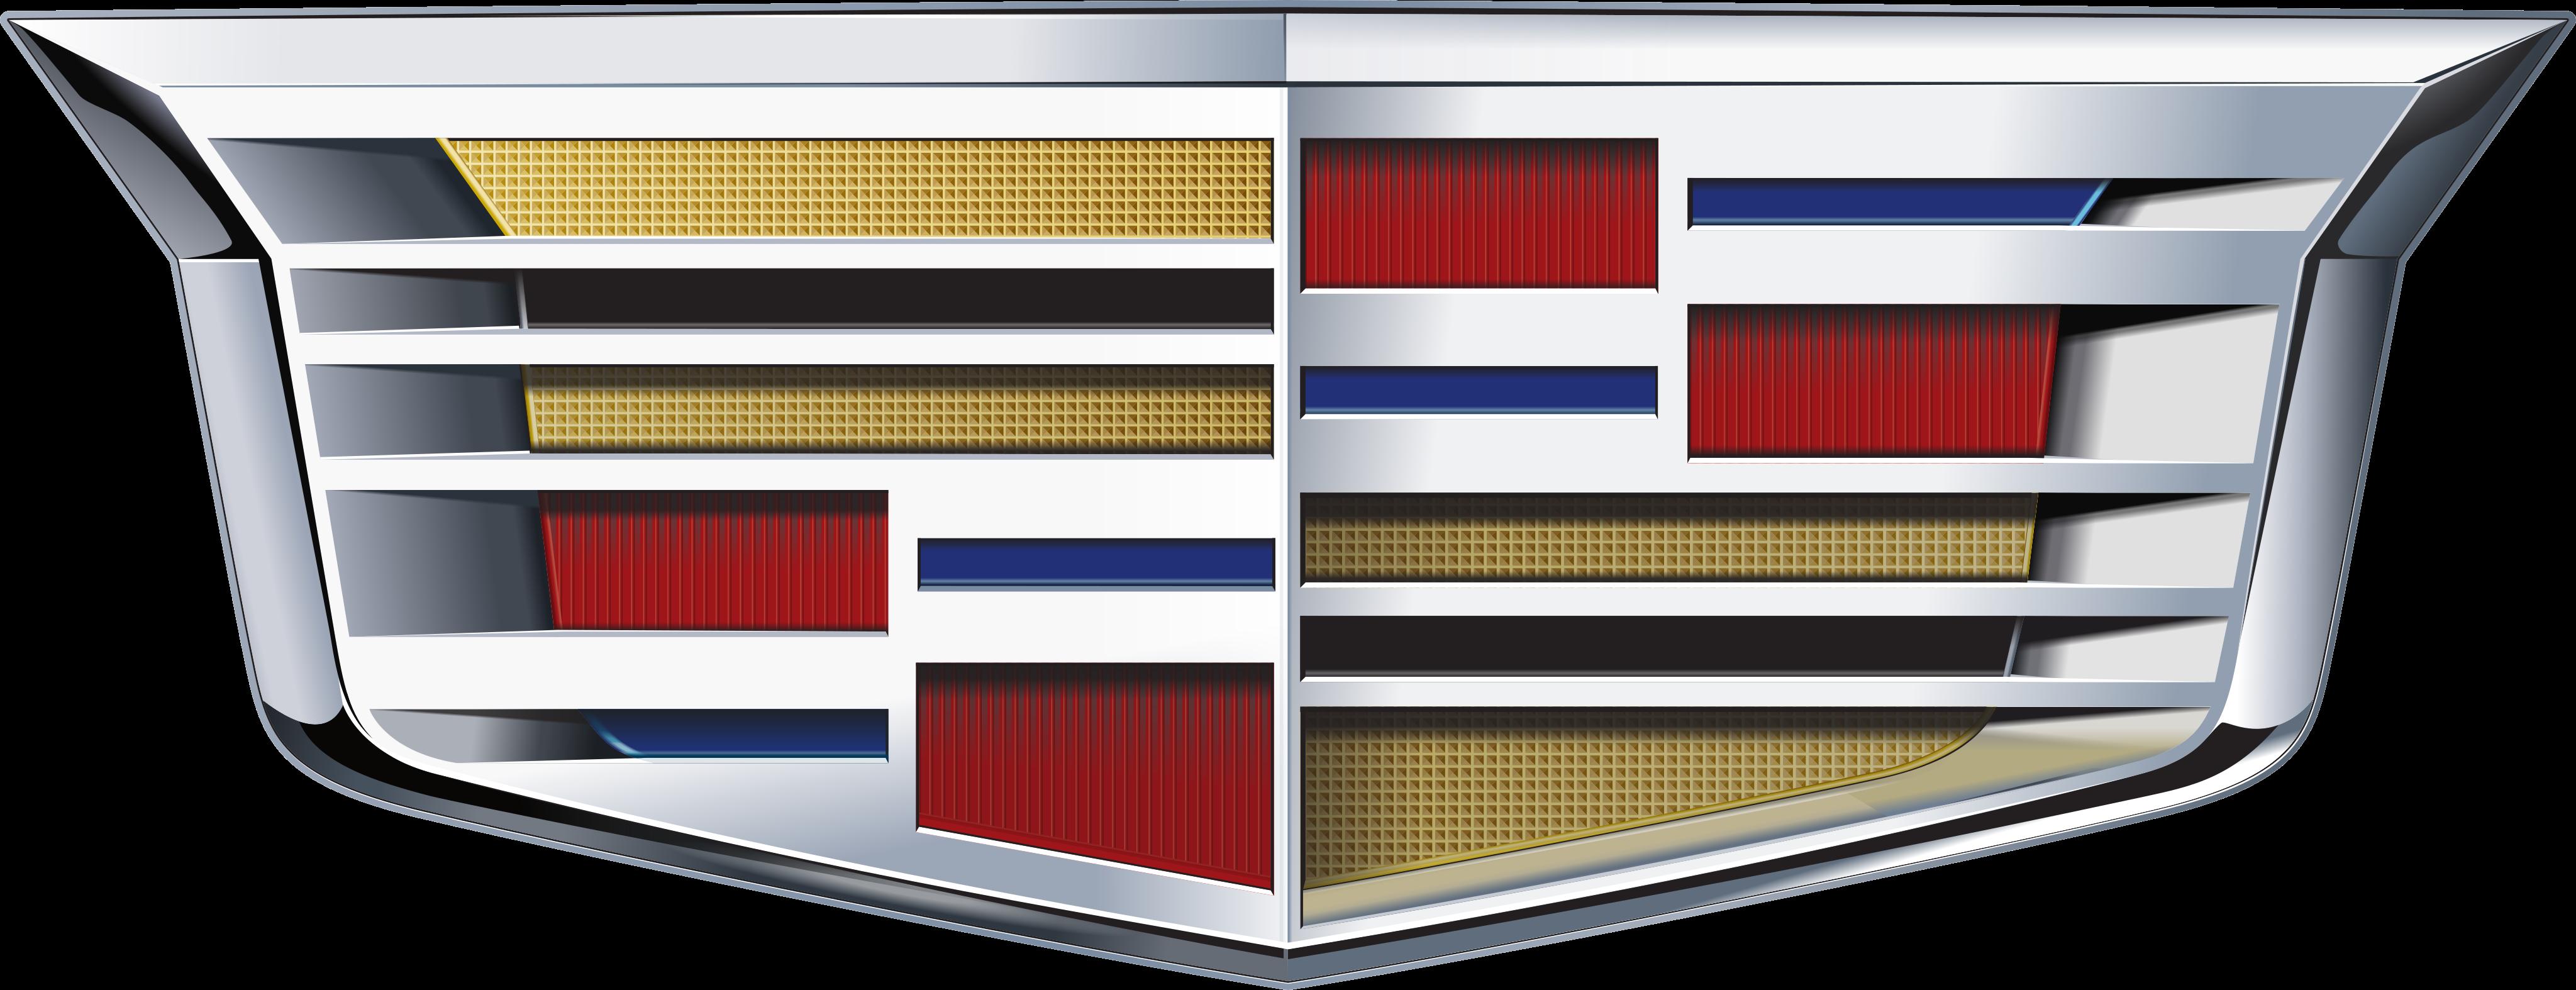 cadillac logo - Cadillac Logo